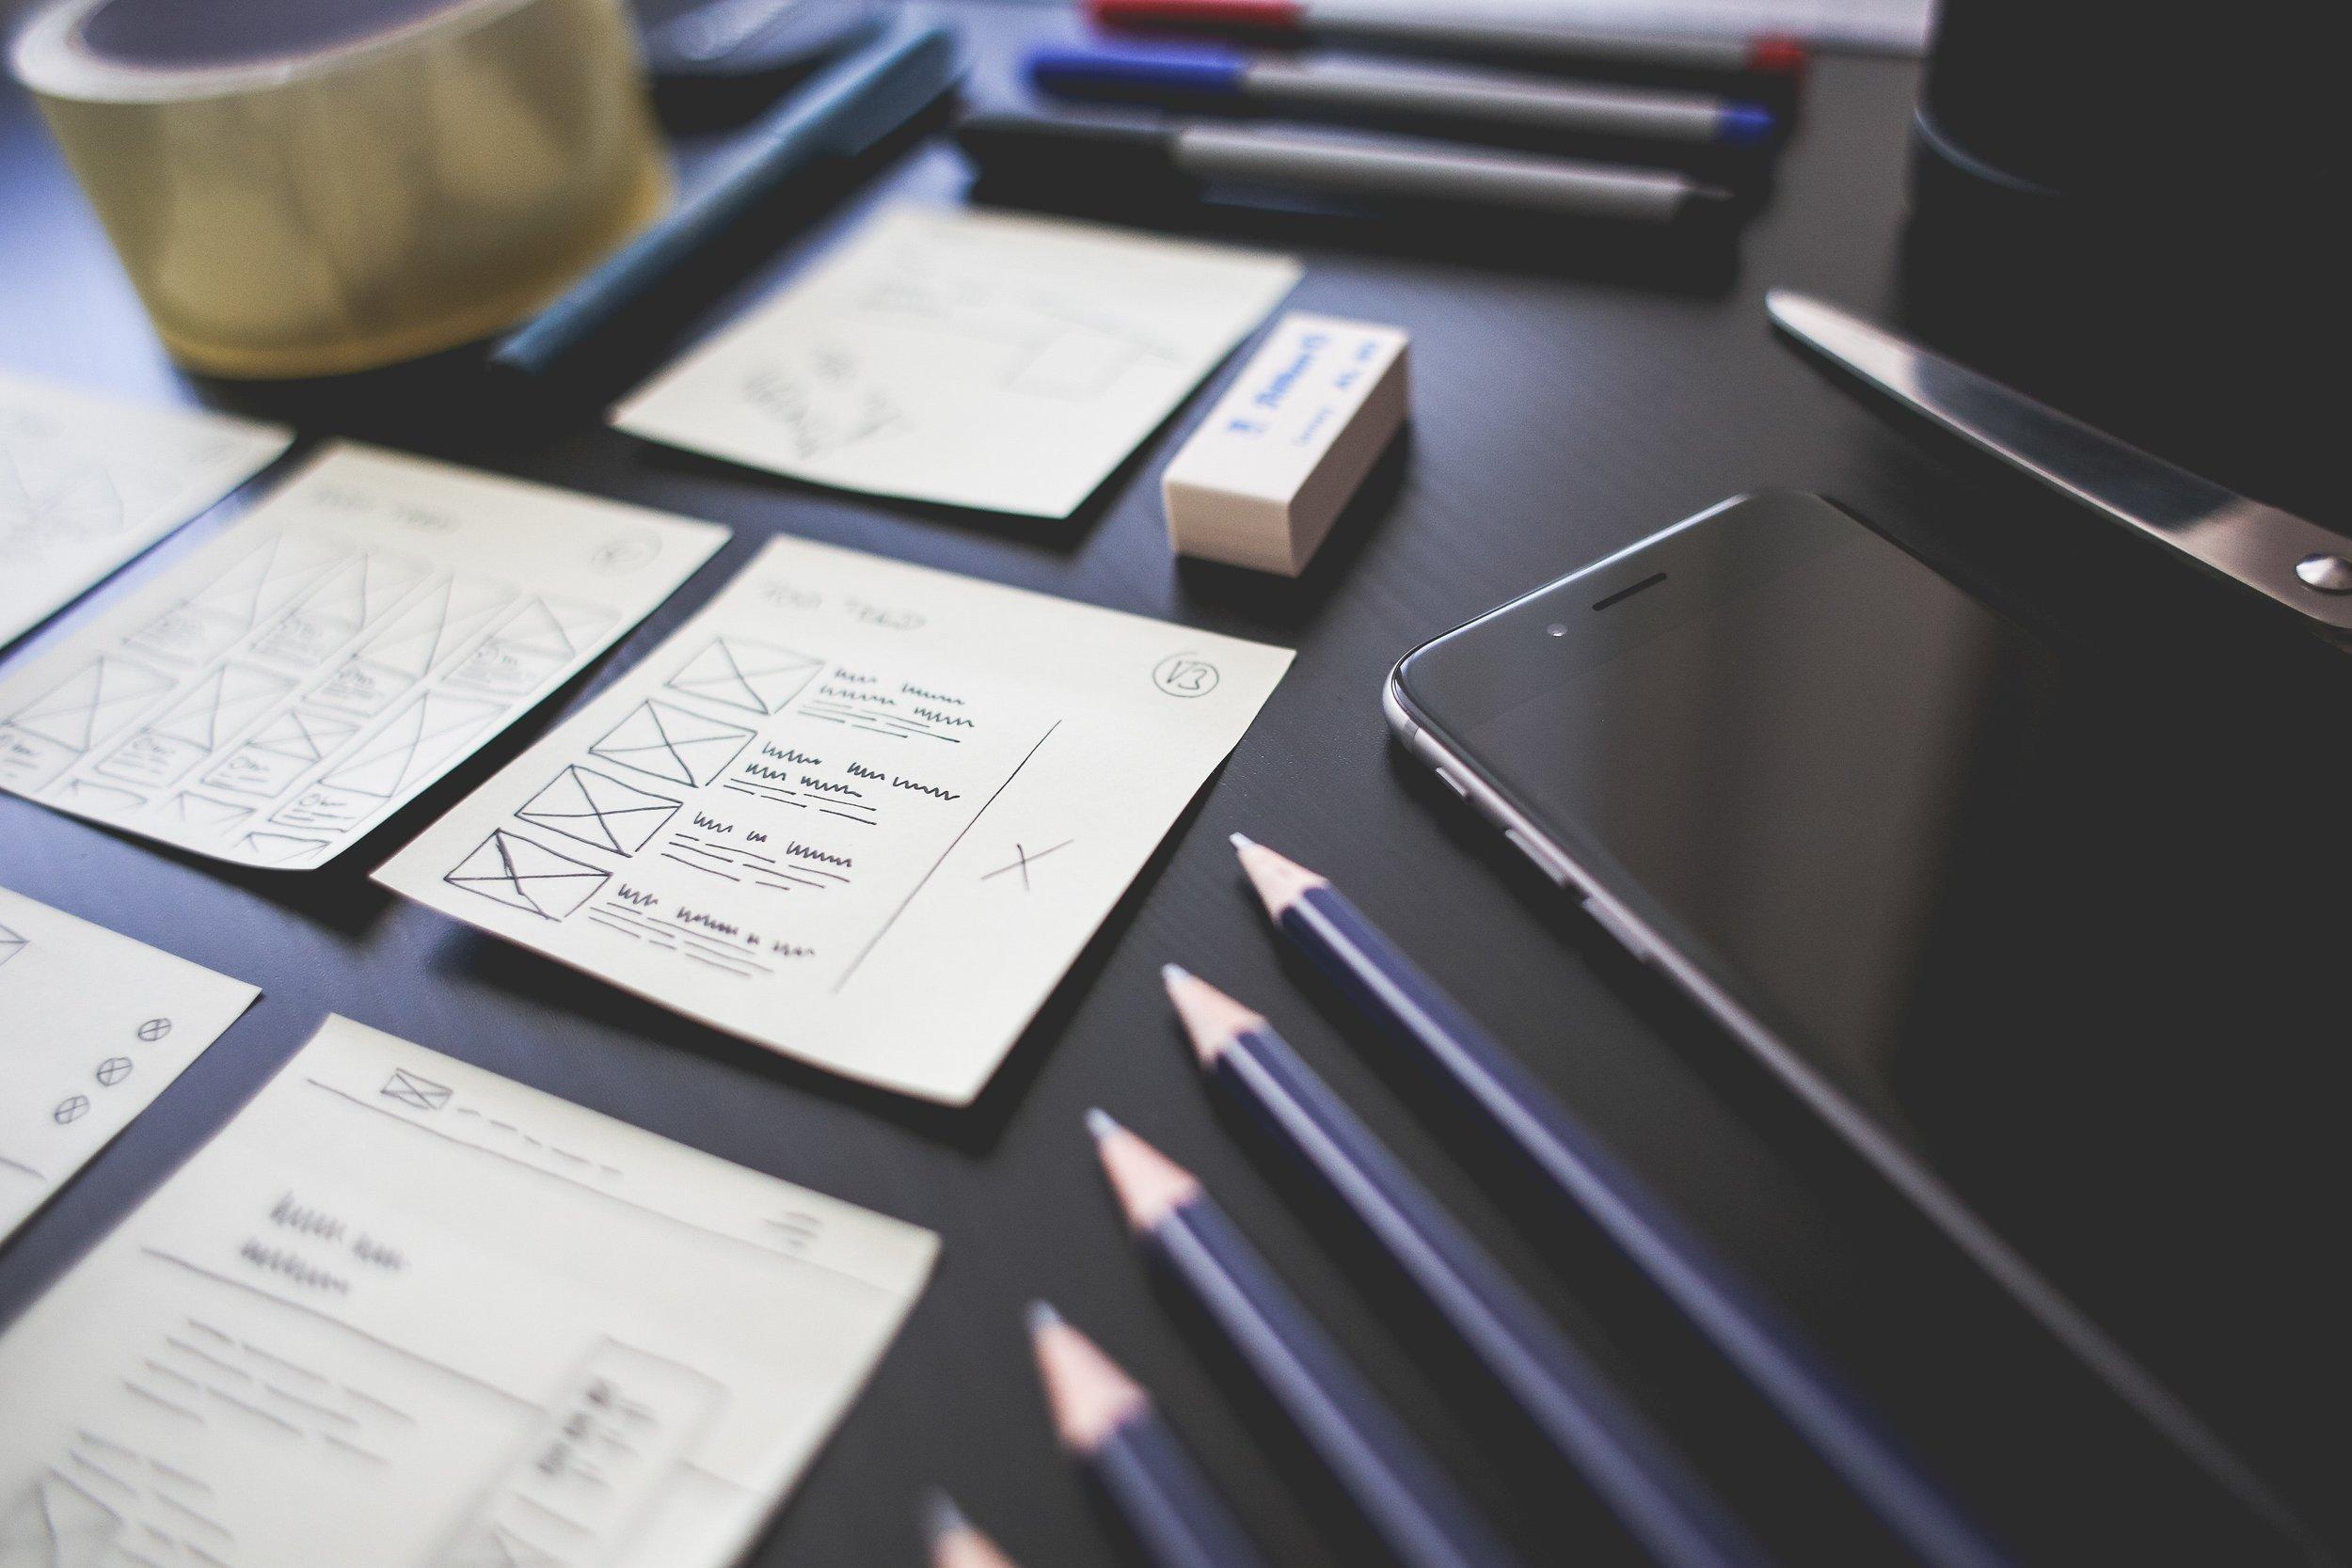 design - デジタル化により既存のビジネスモデルや競争原理が破壊された今日。消費者に生活や行動が日々大きく変化している中、消費者のニーズを深く洞察し、そのニーズに応える魅力的な「顧客体験」を提供するための事業戦略策定、および実現に向けた実行計画の策定を行うことで、クライアントと消費者との関係性の設計・構築を全般的に支援します。